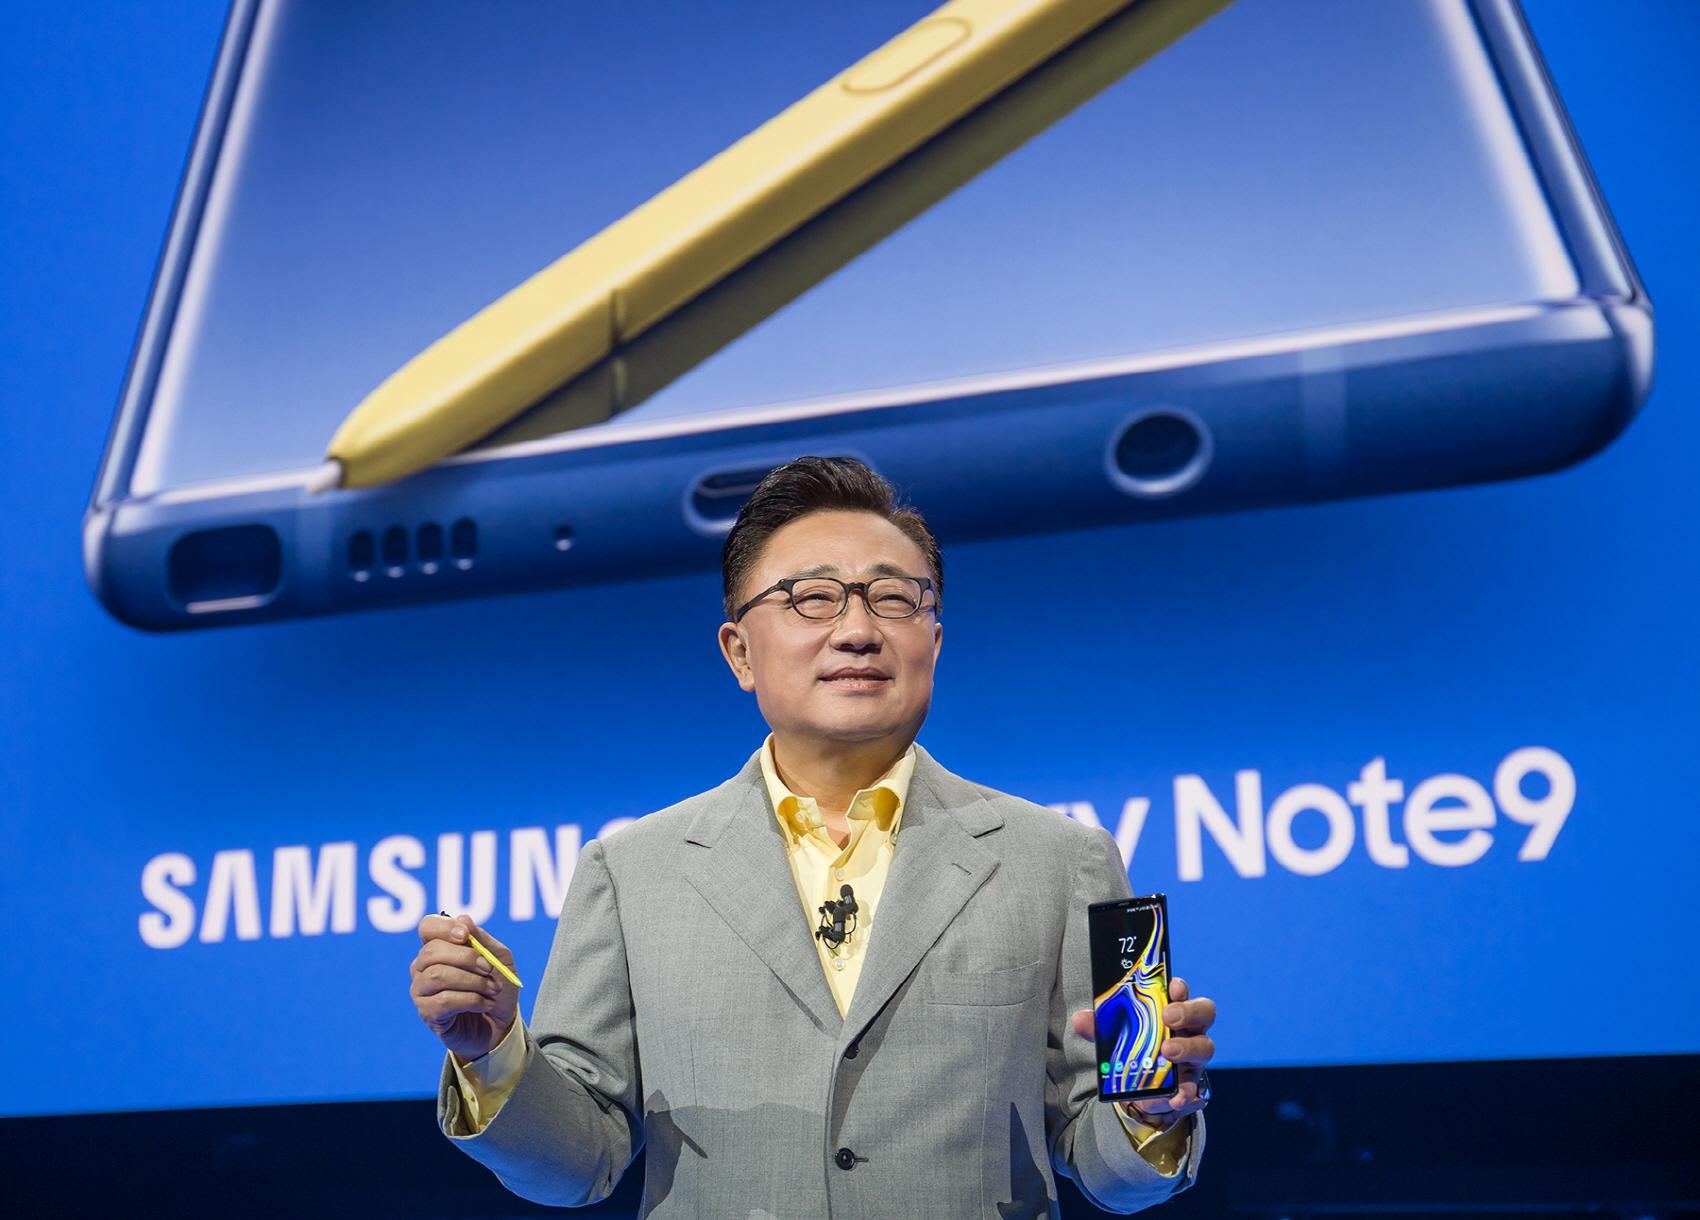 Скидка 30% нафлагманы Samsung иначало продаж Galaxy Note 9